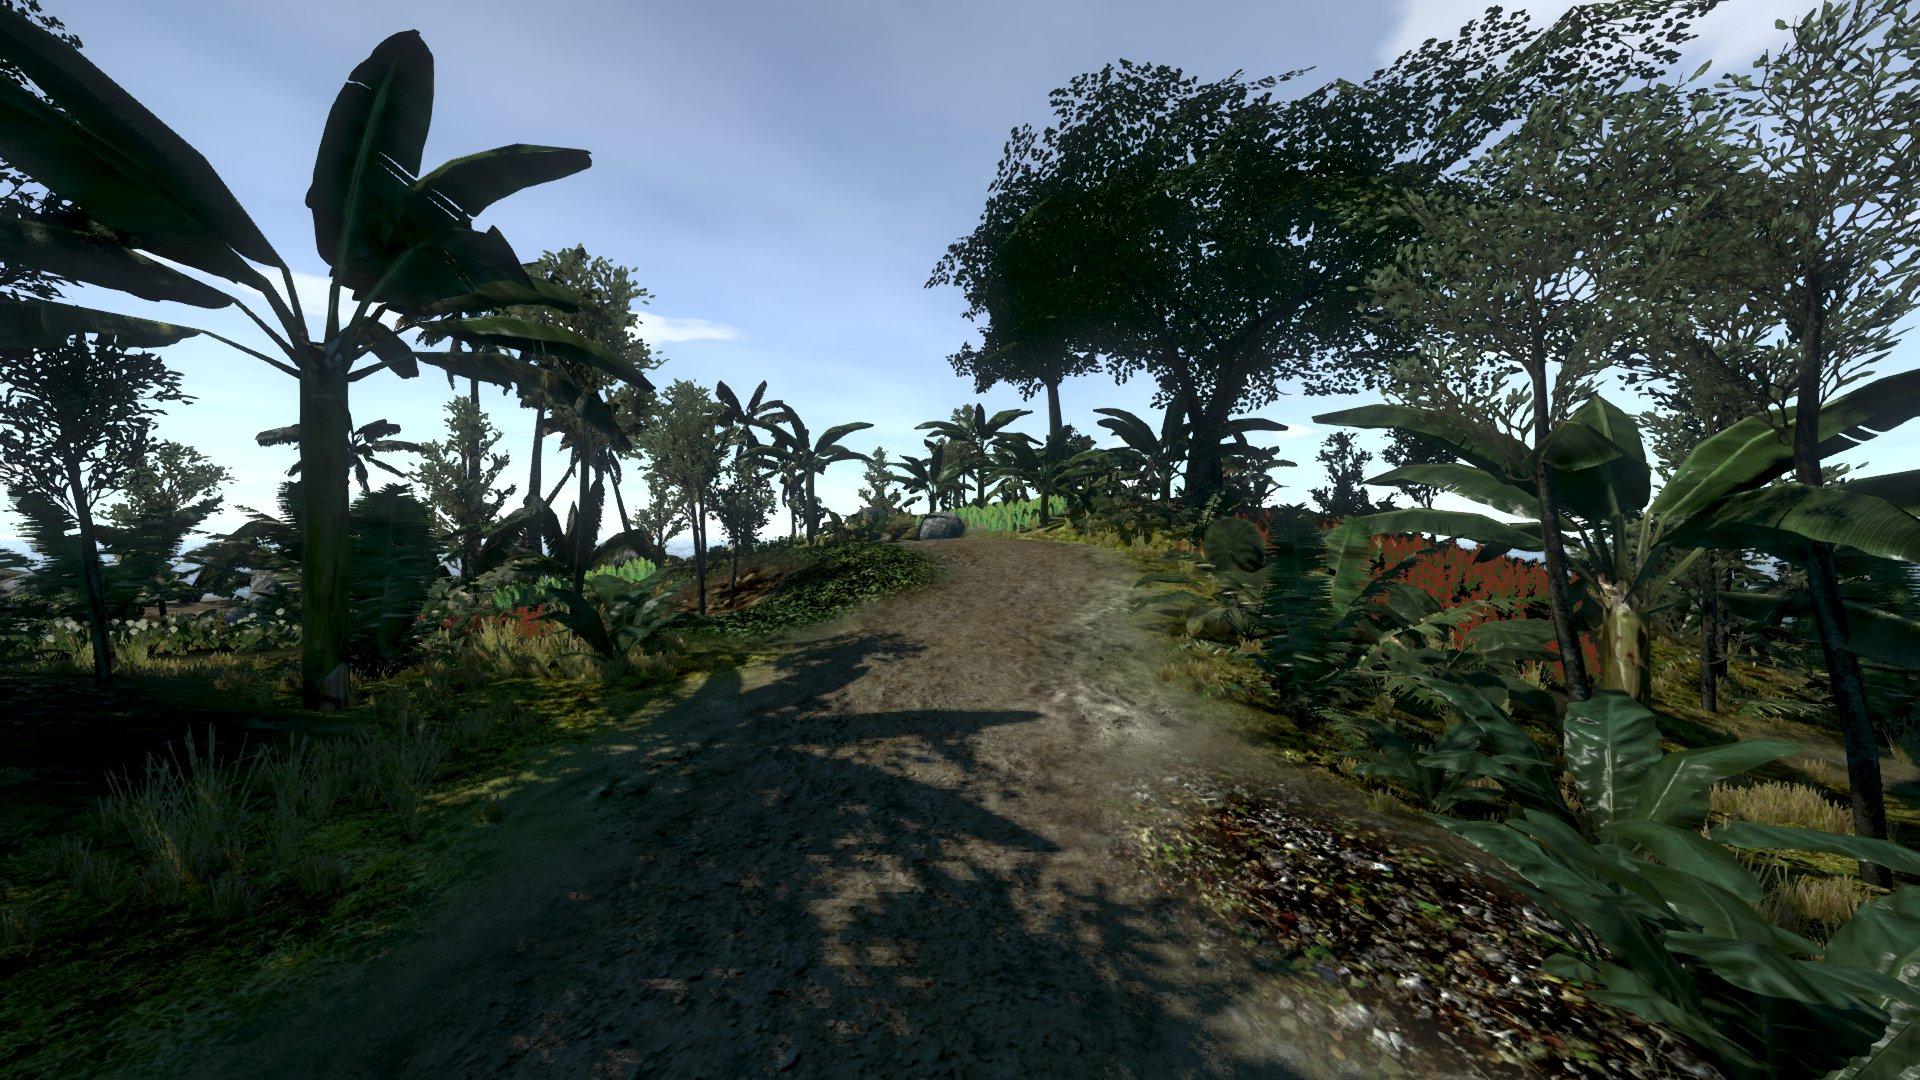 screenshot Pazifik Gardens by da